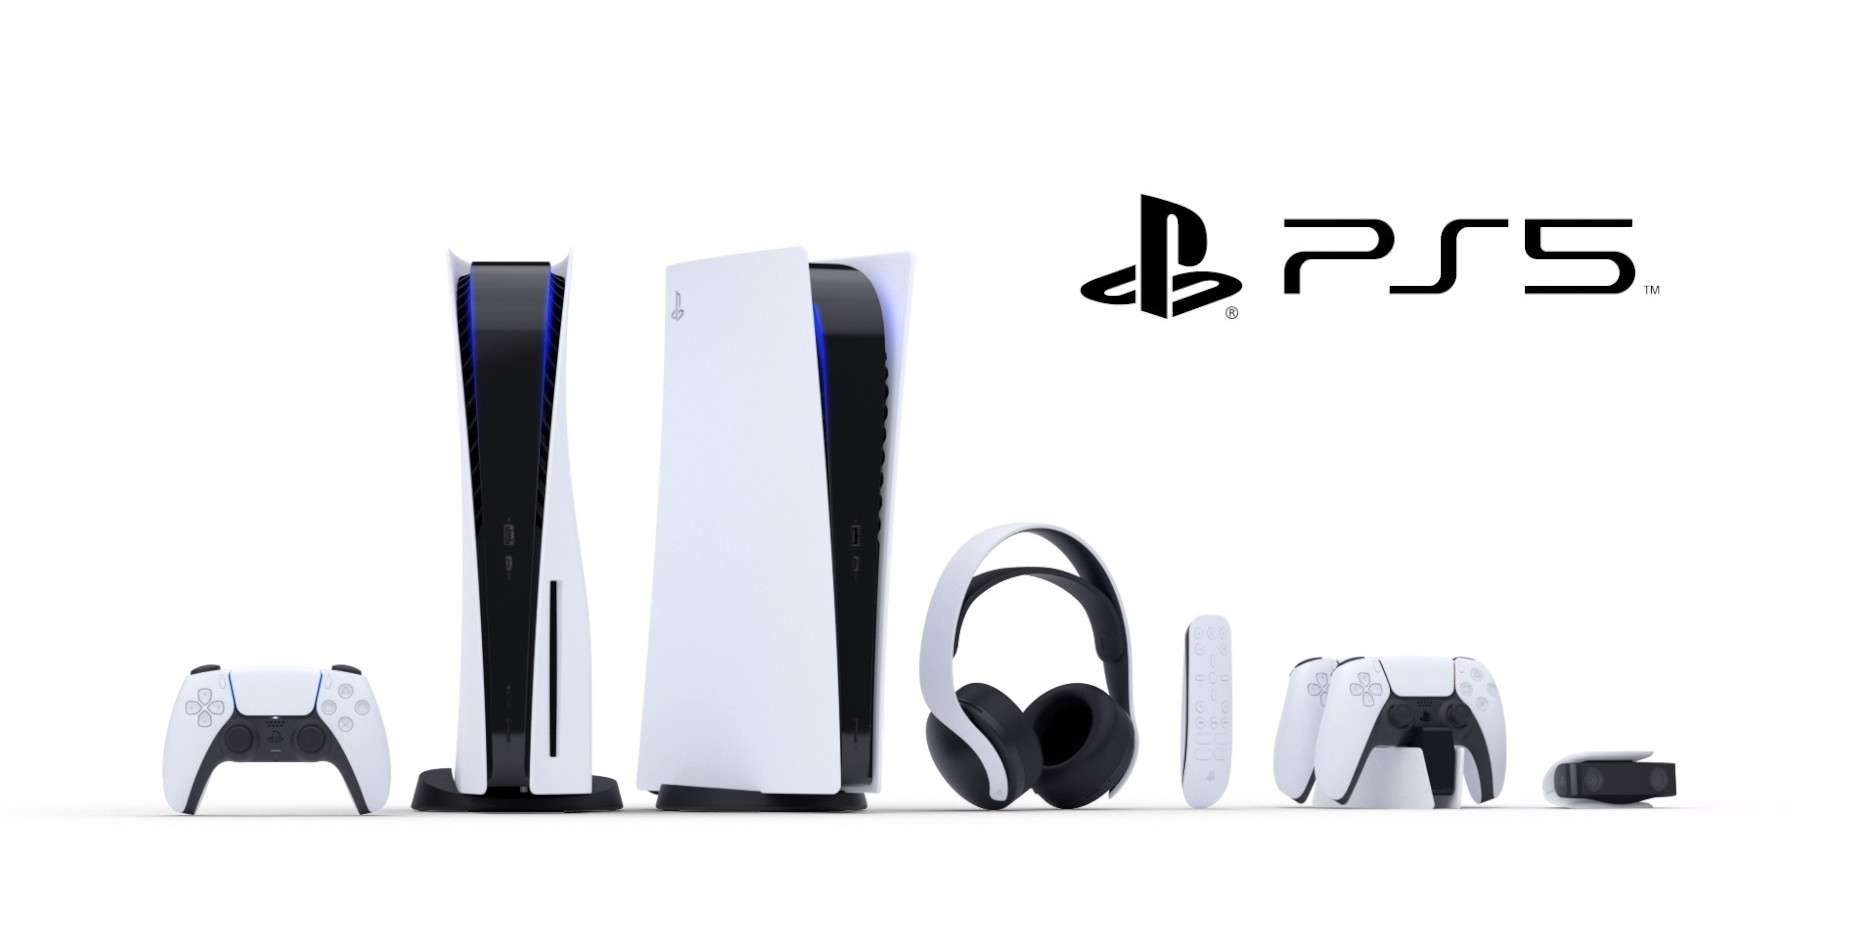 ps5 console & accessories